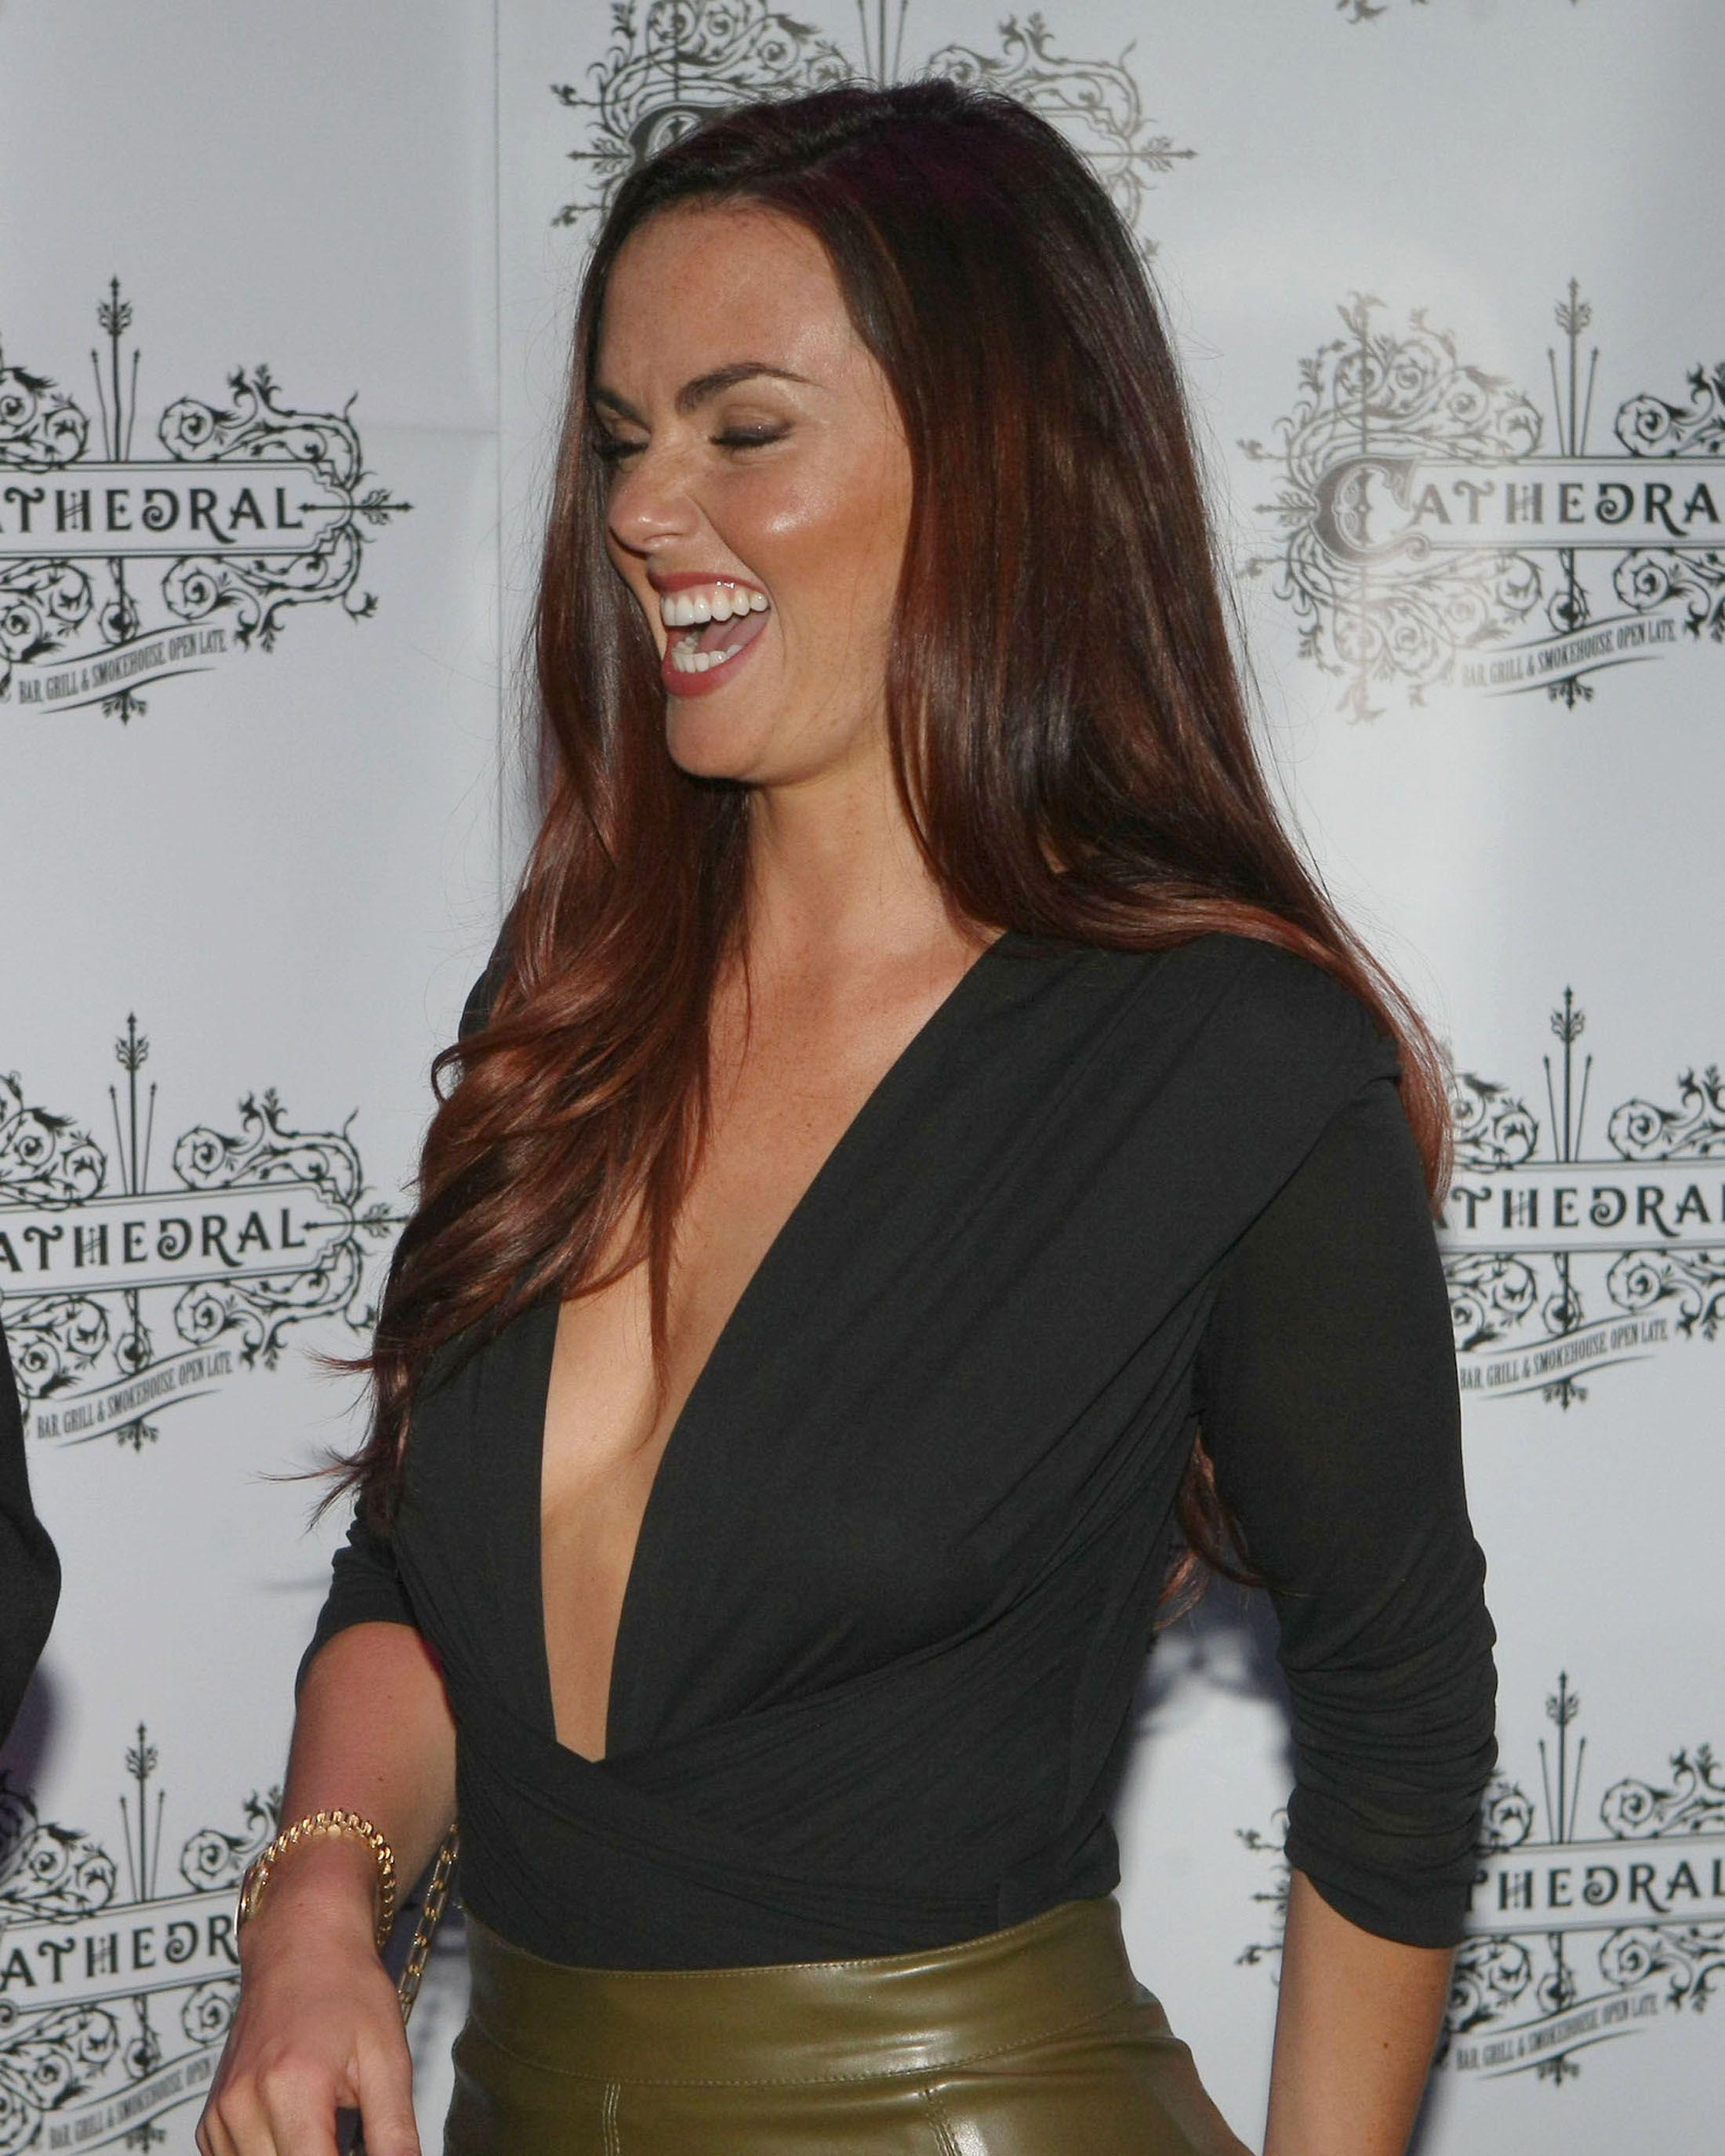 Jennifer Metcalfe at Cathedral Club Kildare